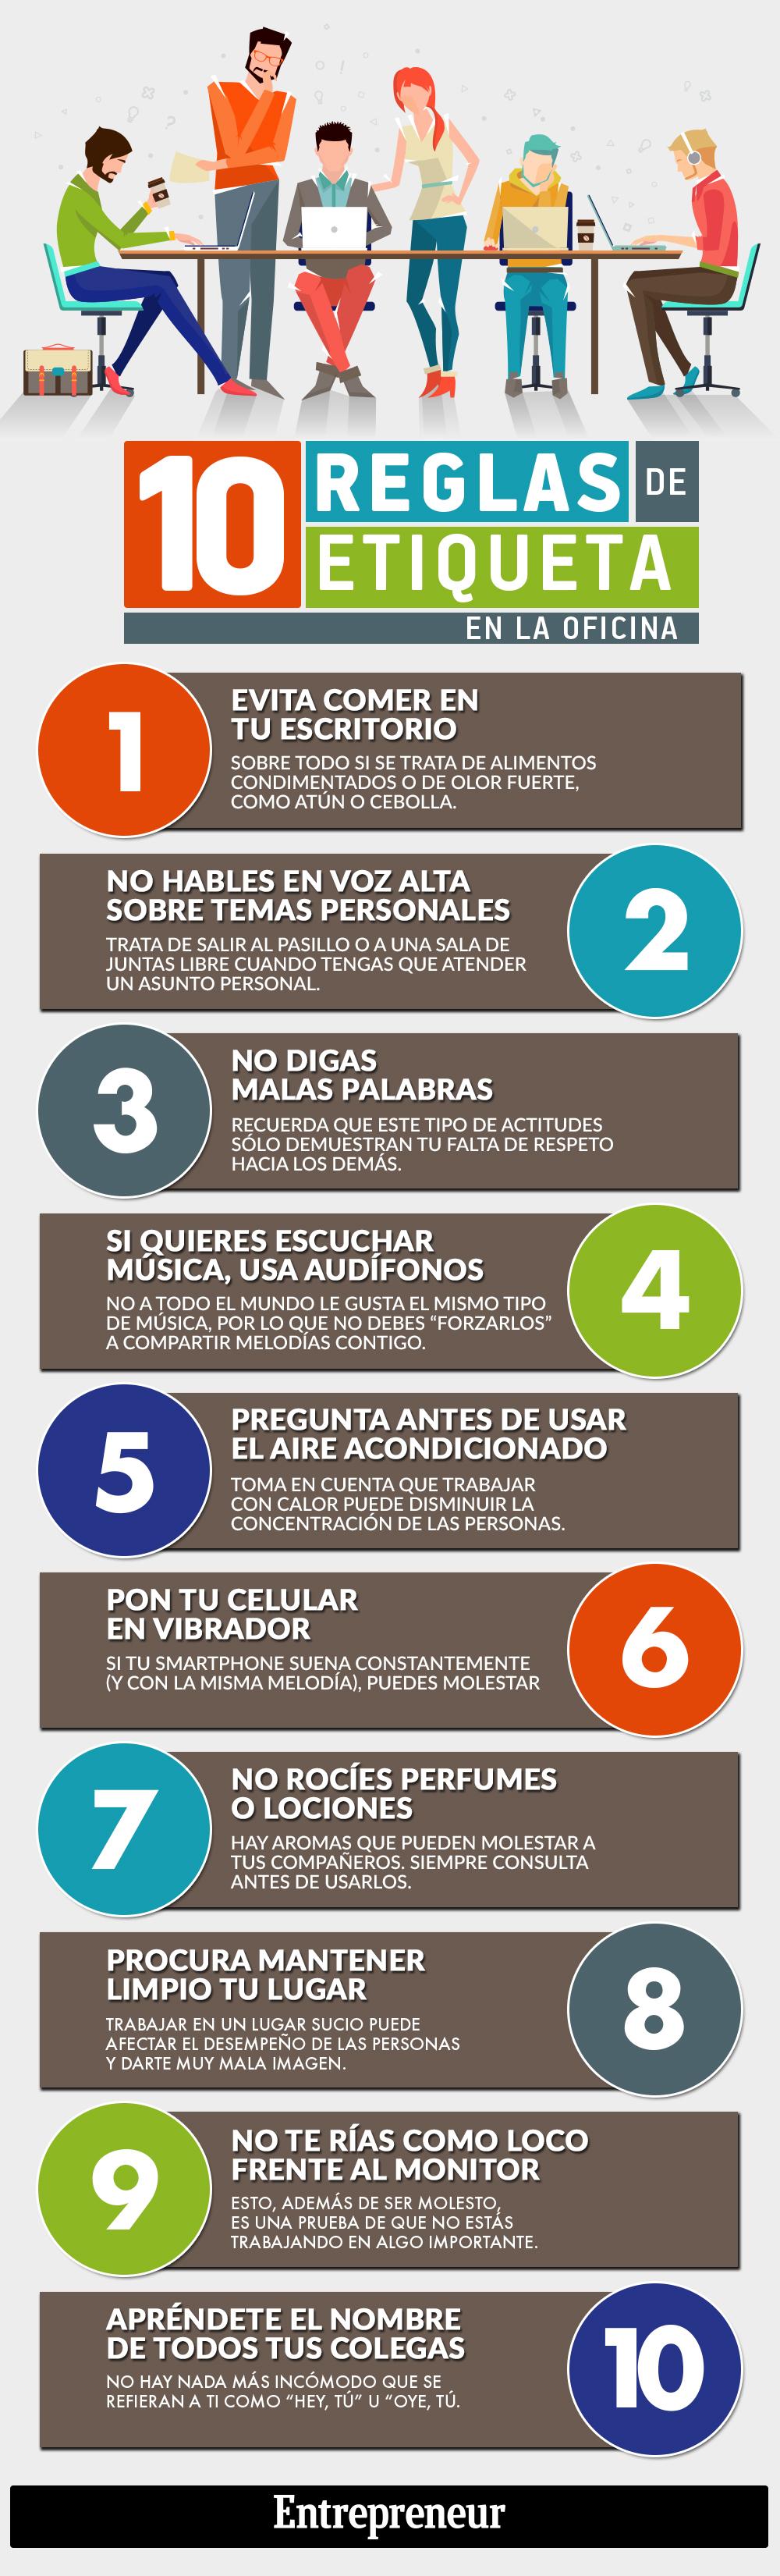 10 reglas de etiqueta en la Oficina #infografia #infographic #rrhh